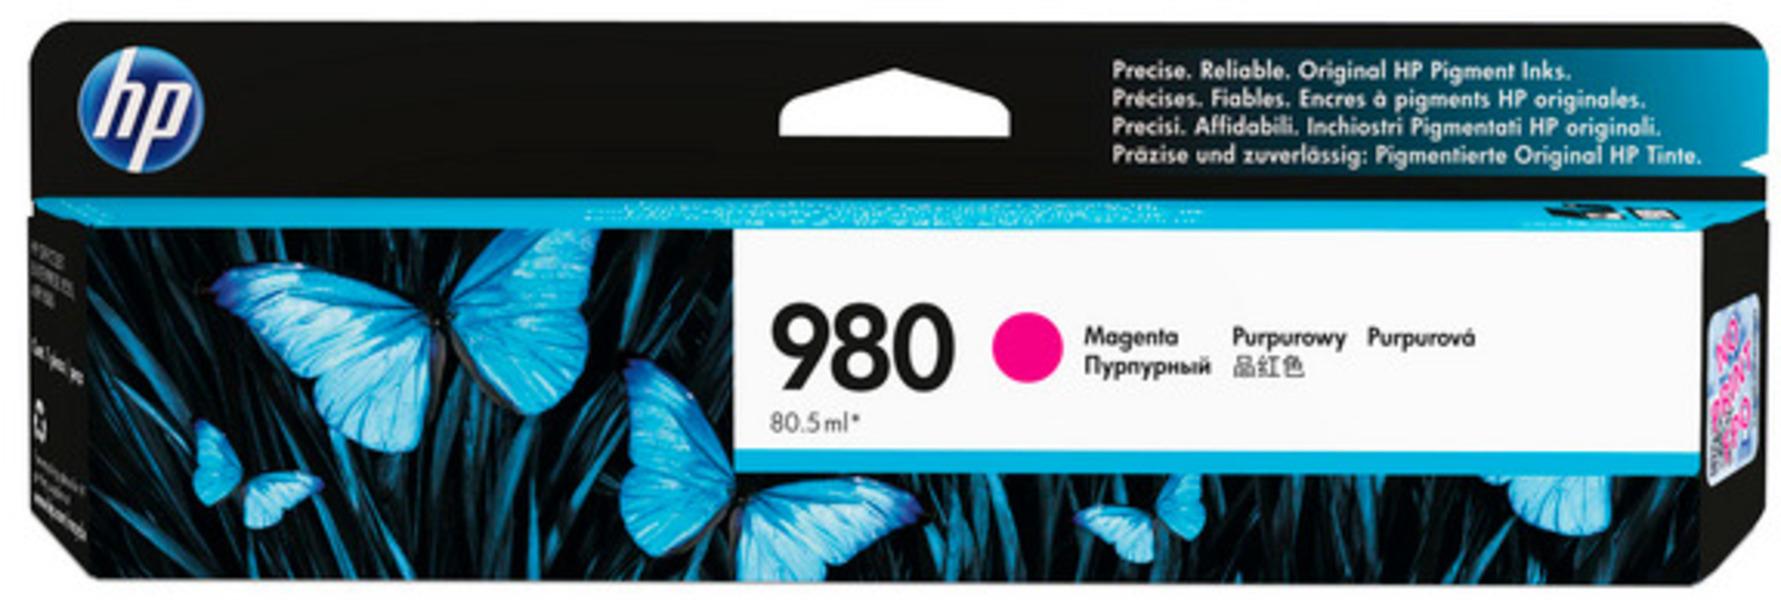 HP Ink/980 Magenta Original Cartridge D8J08A